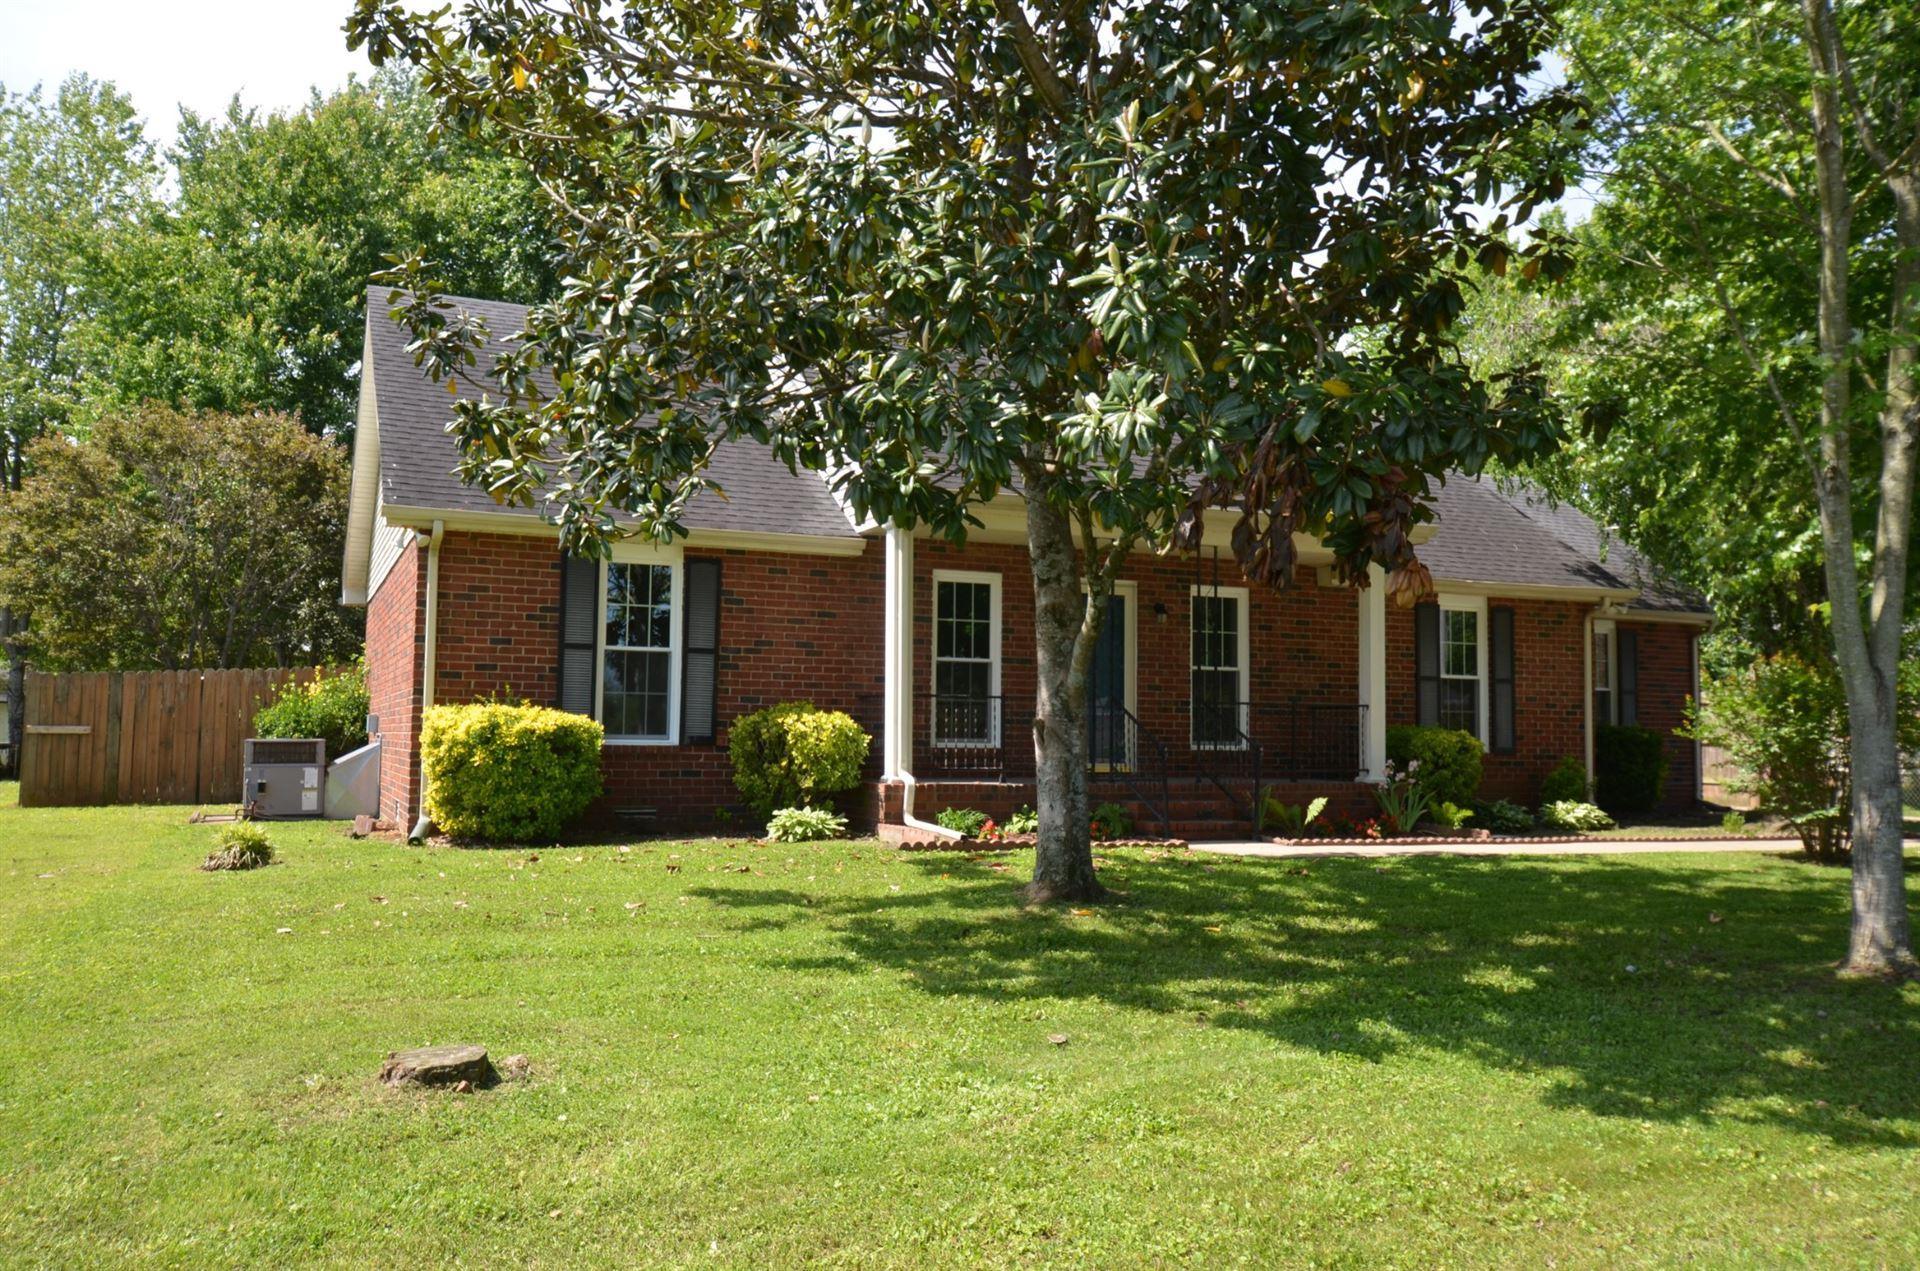 2319 Centertree Dr, Murfreesboro, TN 37128 - MLS#: 2252457